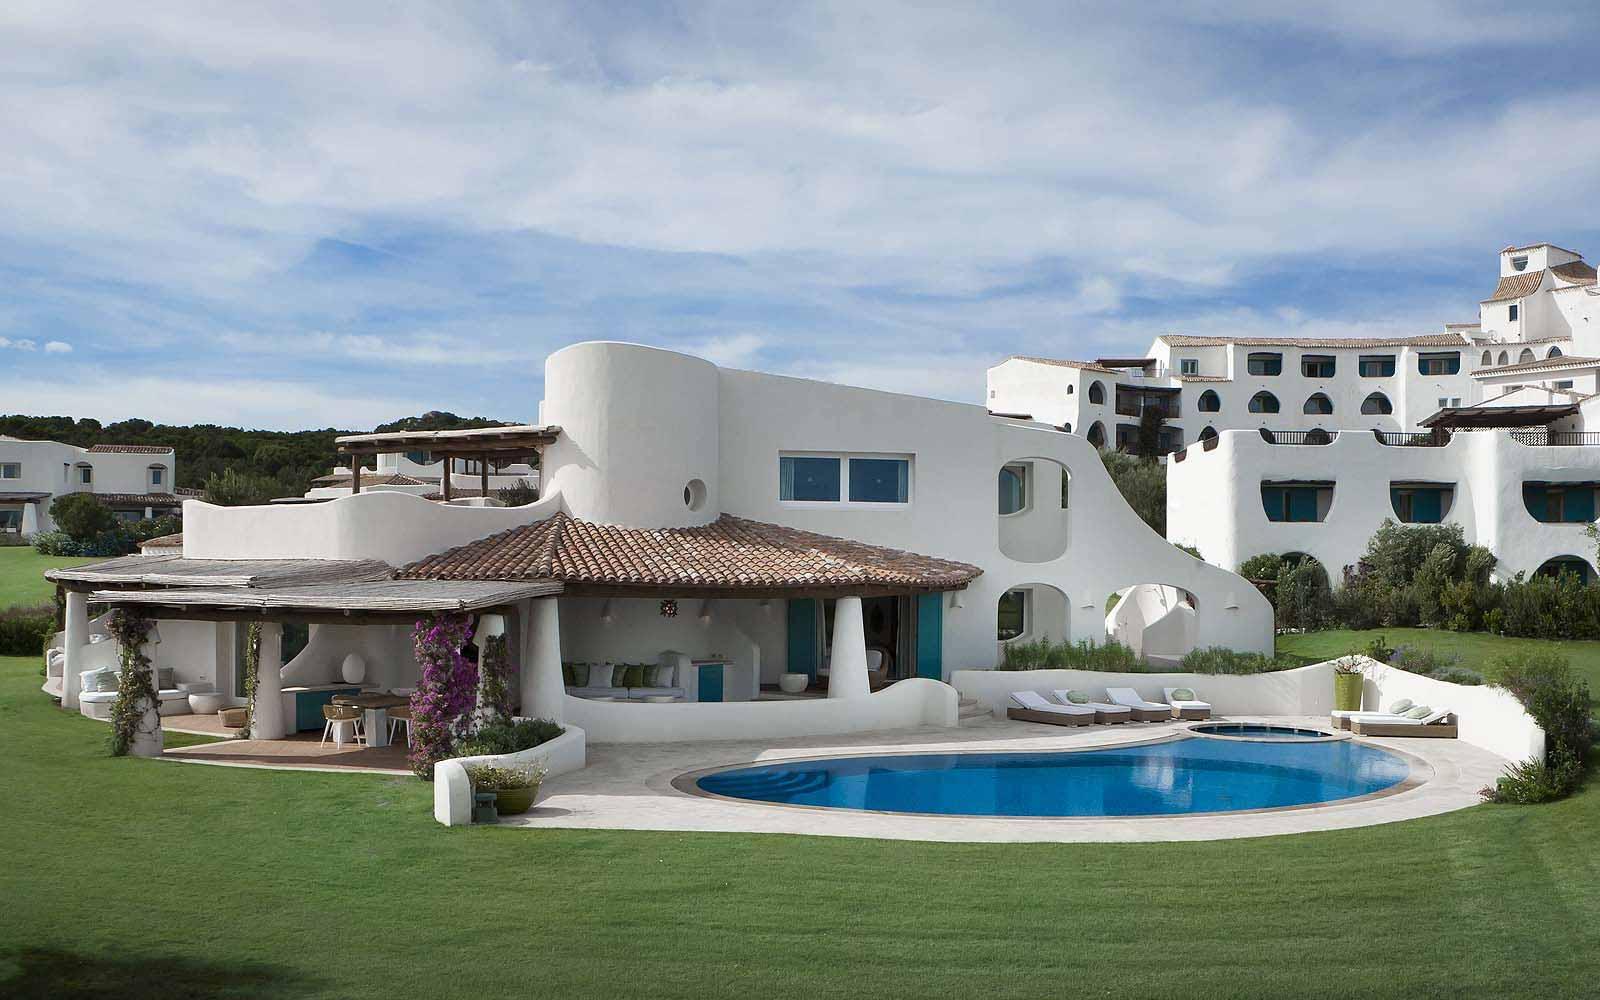 3 Bedroom Villa Acquamarina with private pool at the A Premium Suite's lounge at the Hotel Romazzino